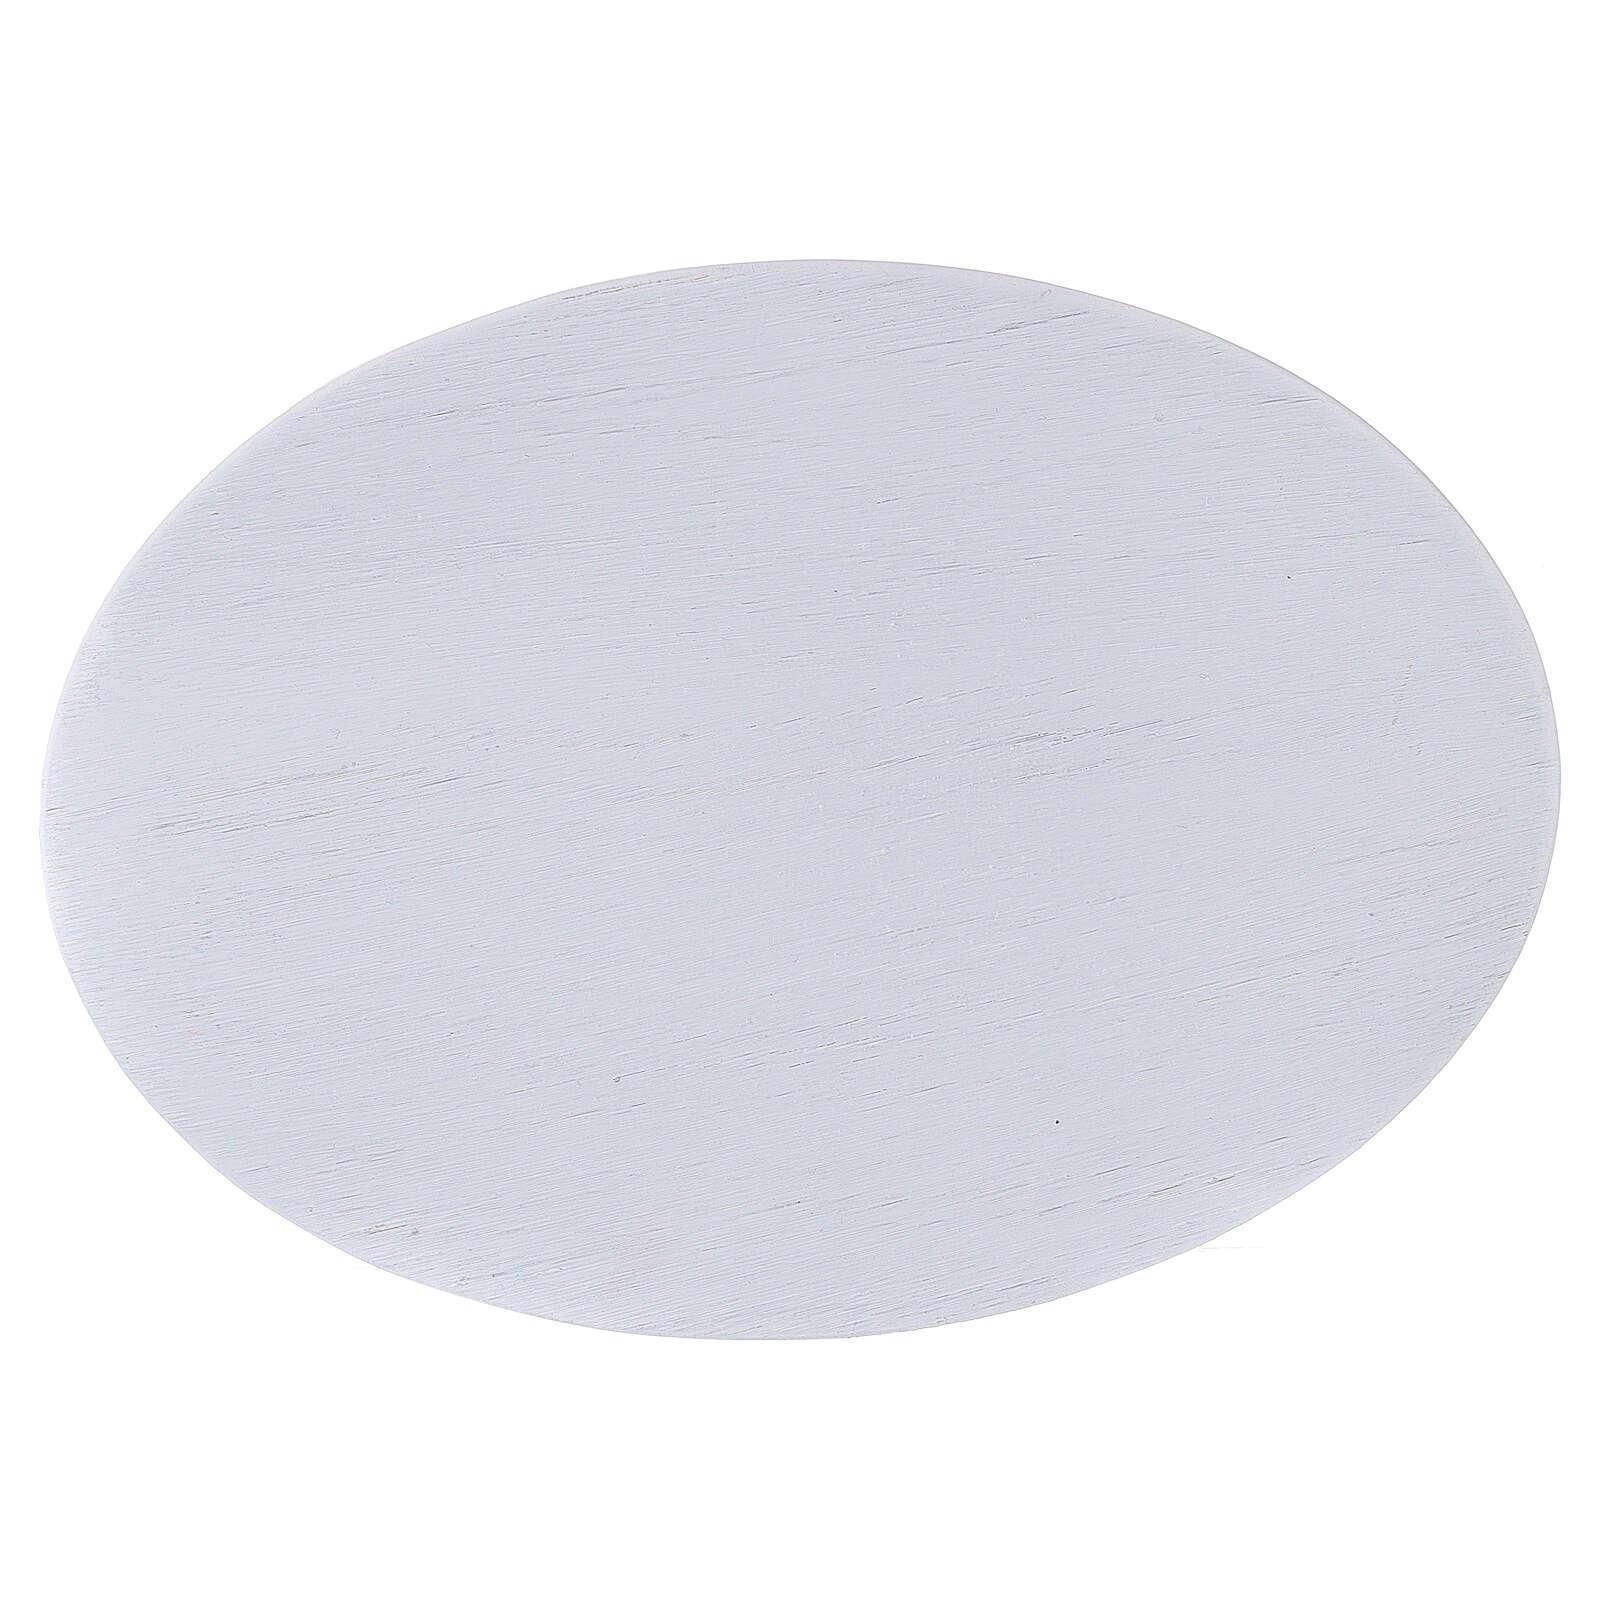 Plato portacirio aluminio blanco cepillado 17x12 cm 3